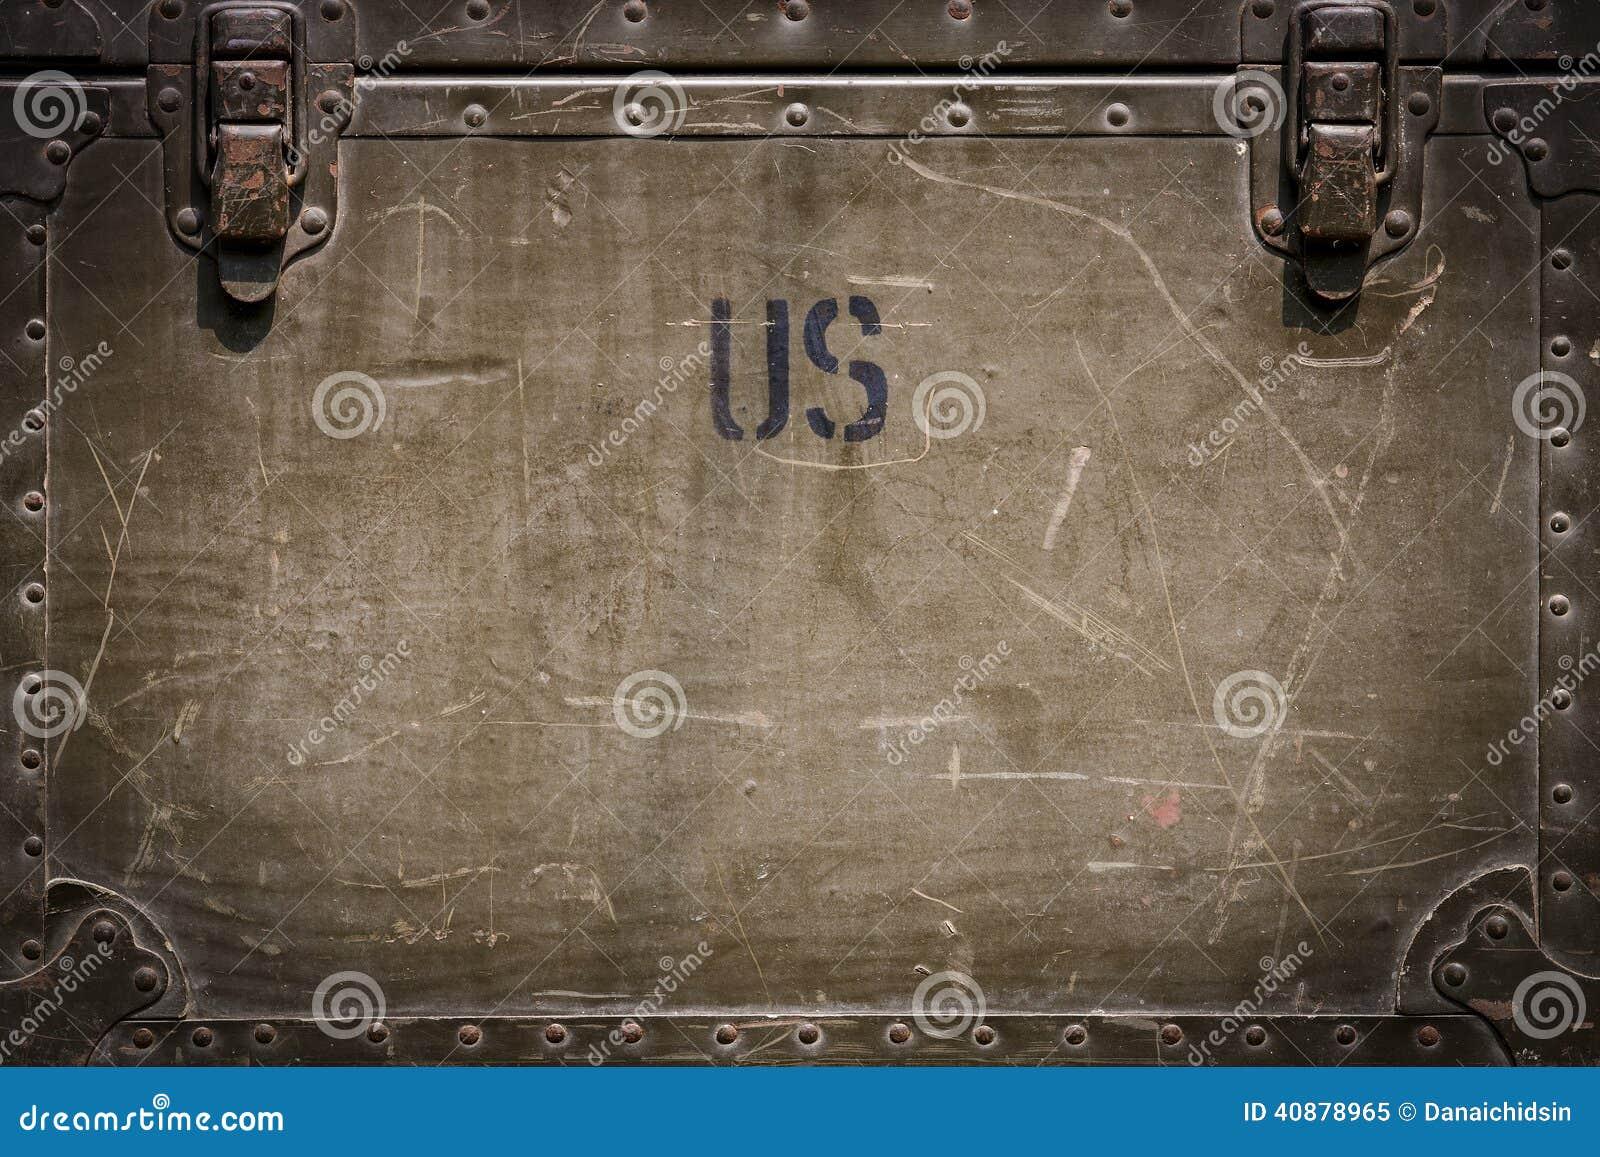 us military background stock image  image of pattern